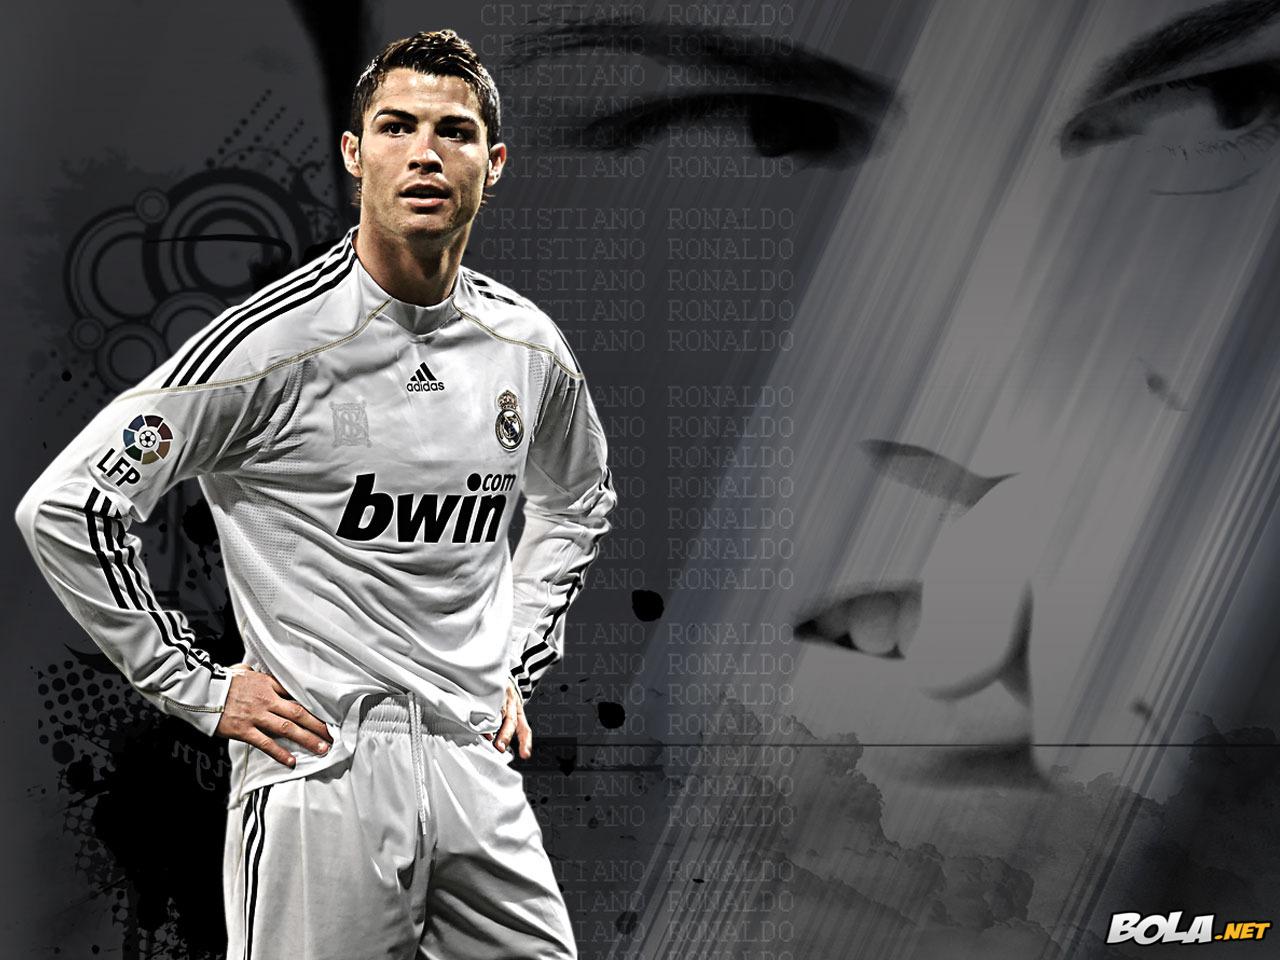 Hd wallpaper ronaldo - Cristiano Ronaldo Hd Wallpapers 2015 Right Click Save Target As